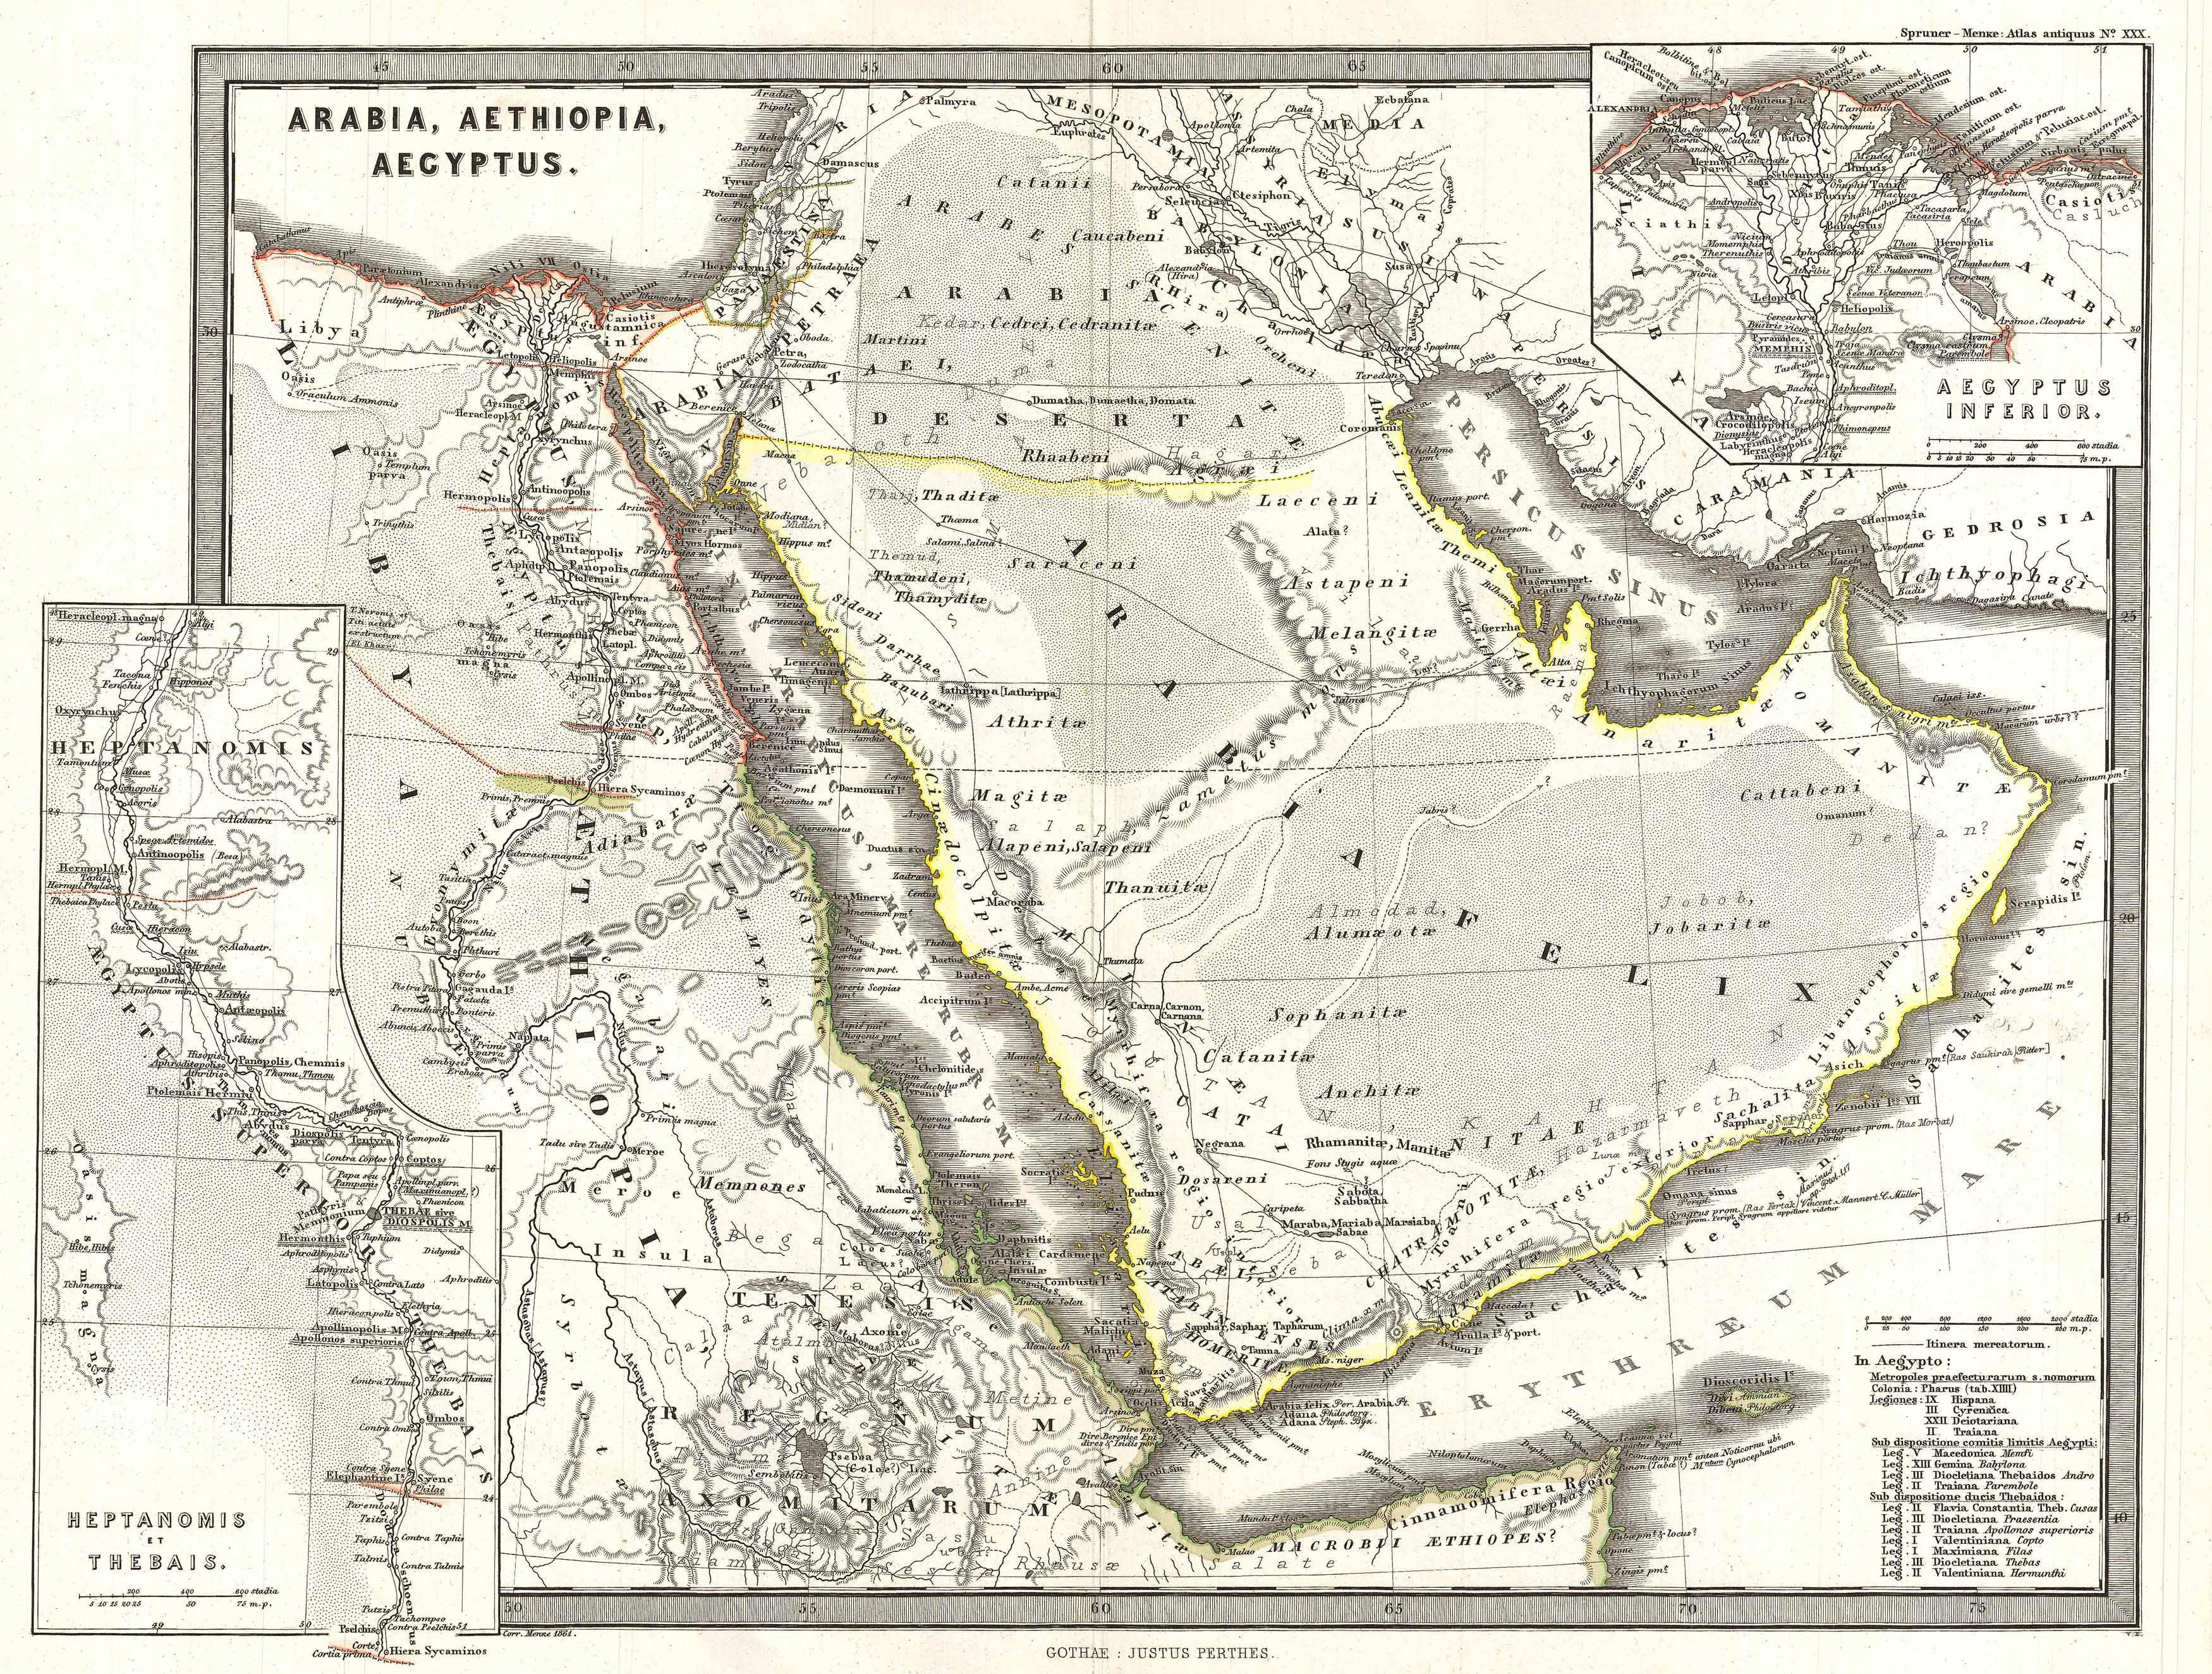 Vintage Maps Of The Arabian Peninsula International History Blog - Vintage map of egypt